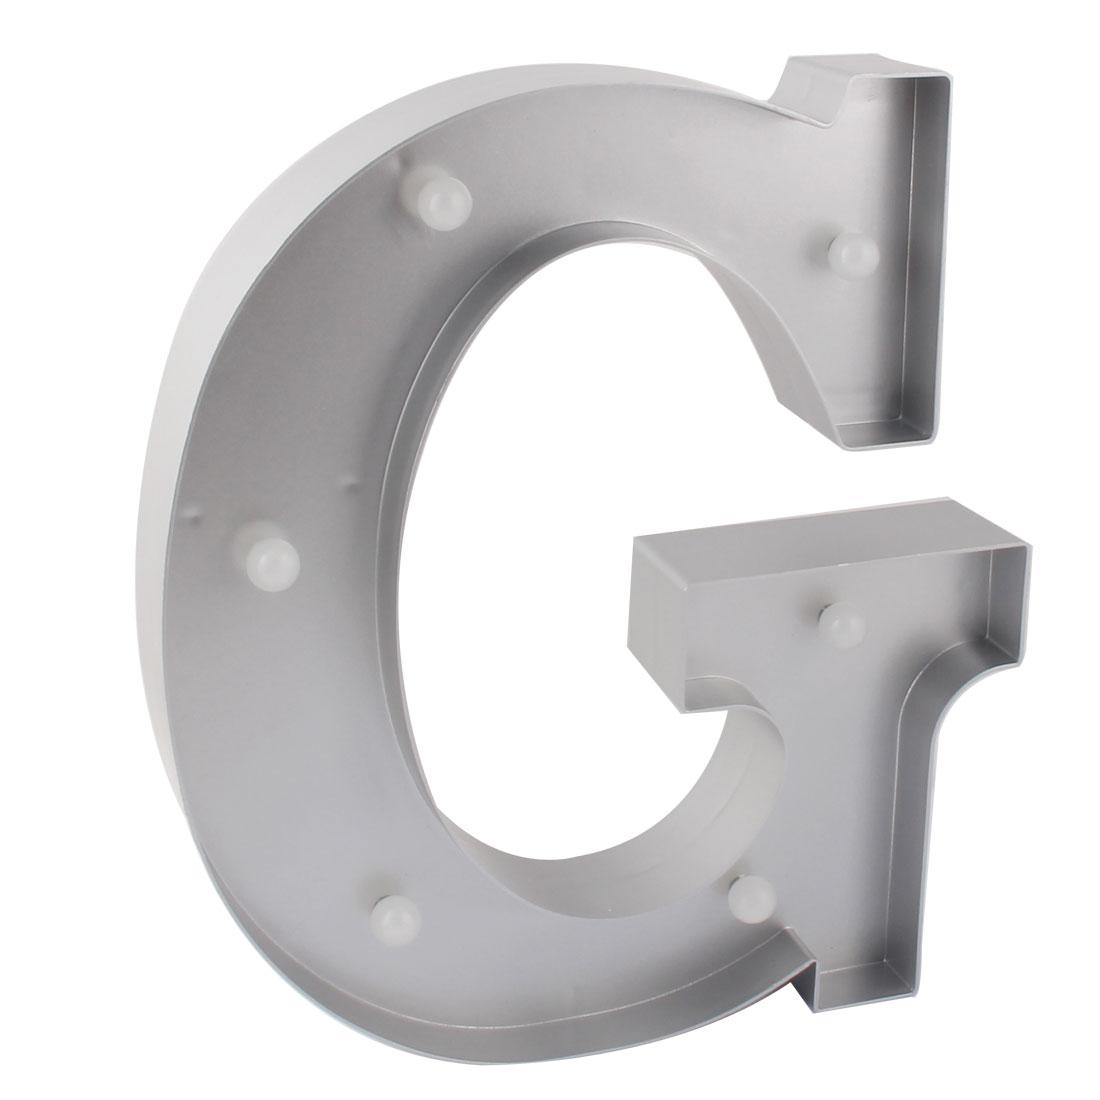 Party Plastic Decor English G Letter Alphabet Free DIY Hanging LED Light Silver Tone